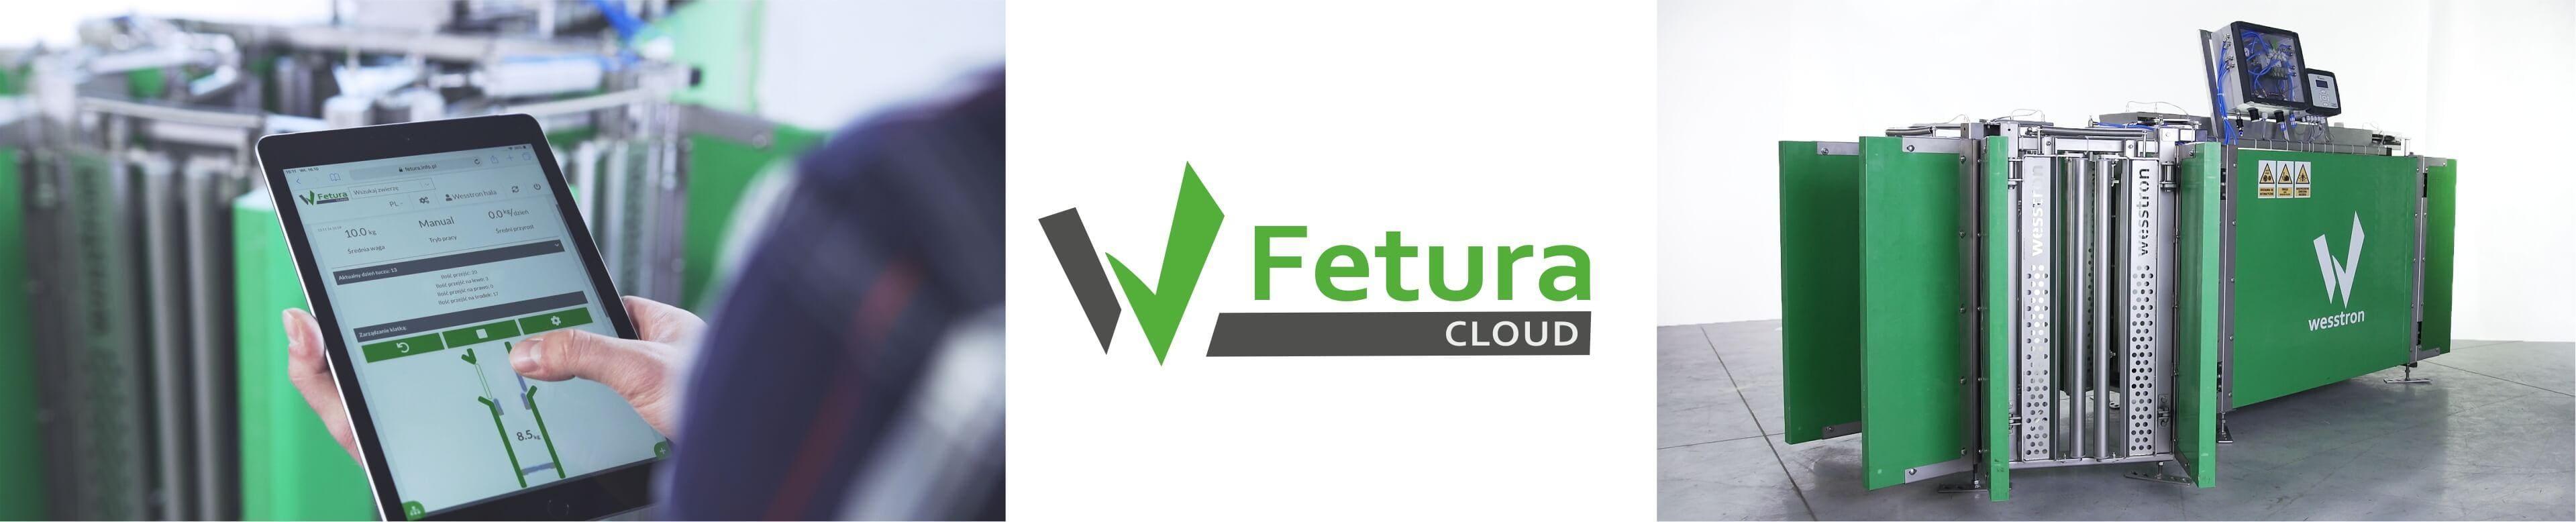 Fetura cloud